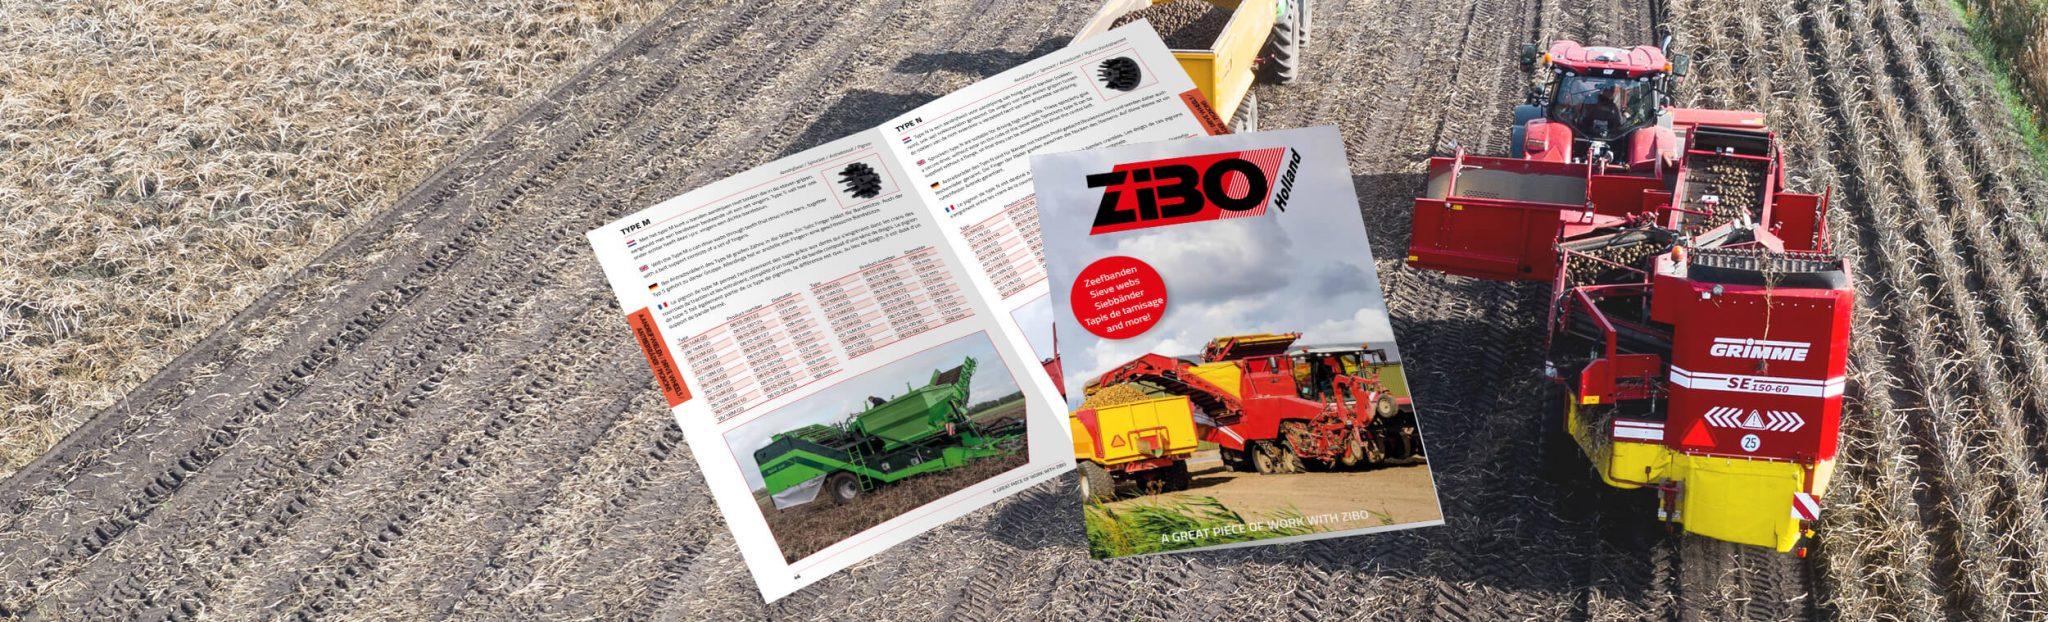 portfolio-klant-2500x759_Zinger_Zeefbanden_Catalogus-2048x622